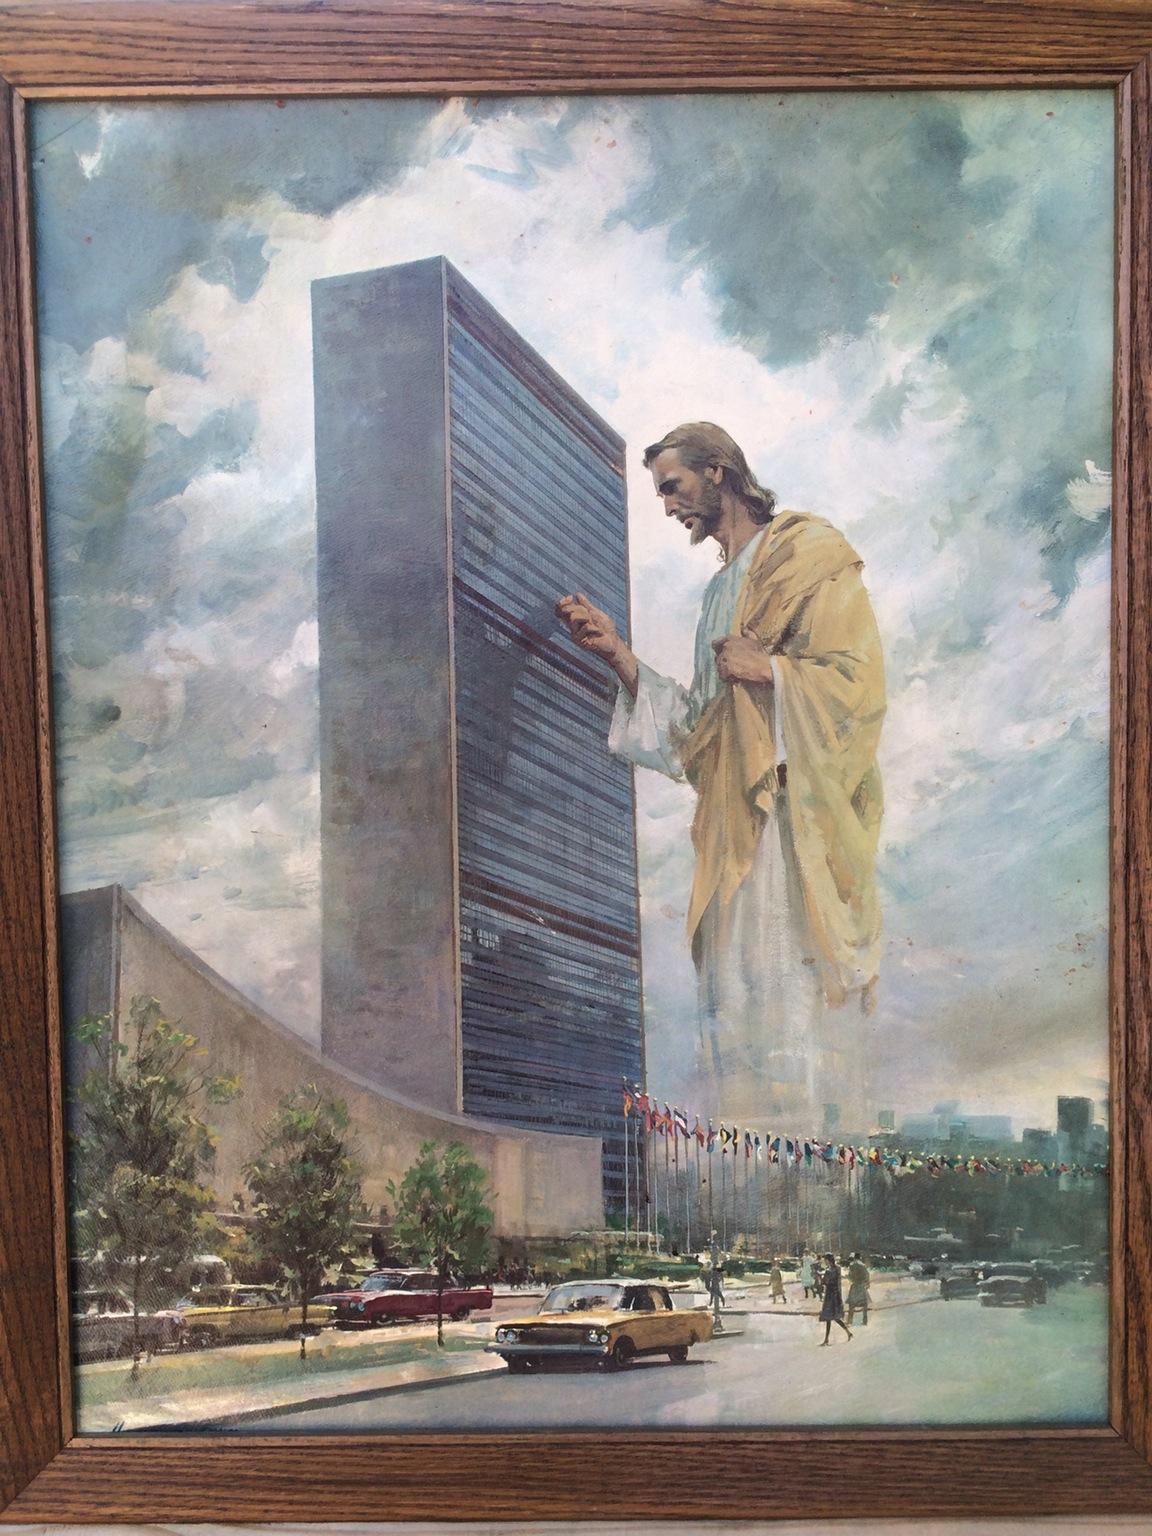 Garage sale find- Jesus at the United Nations building